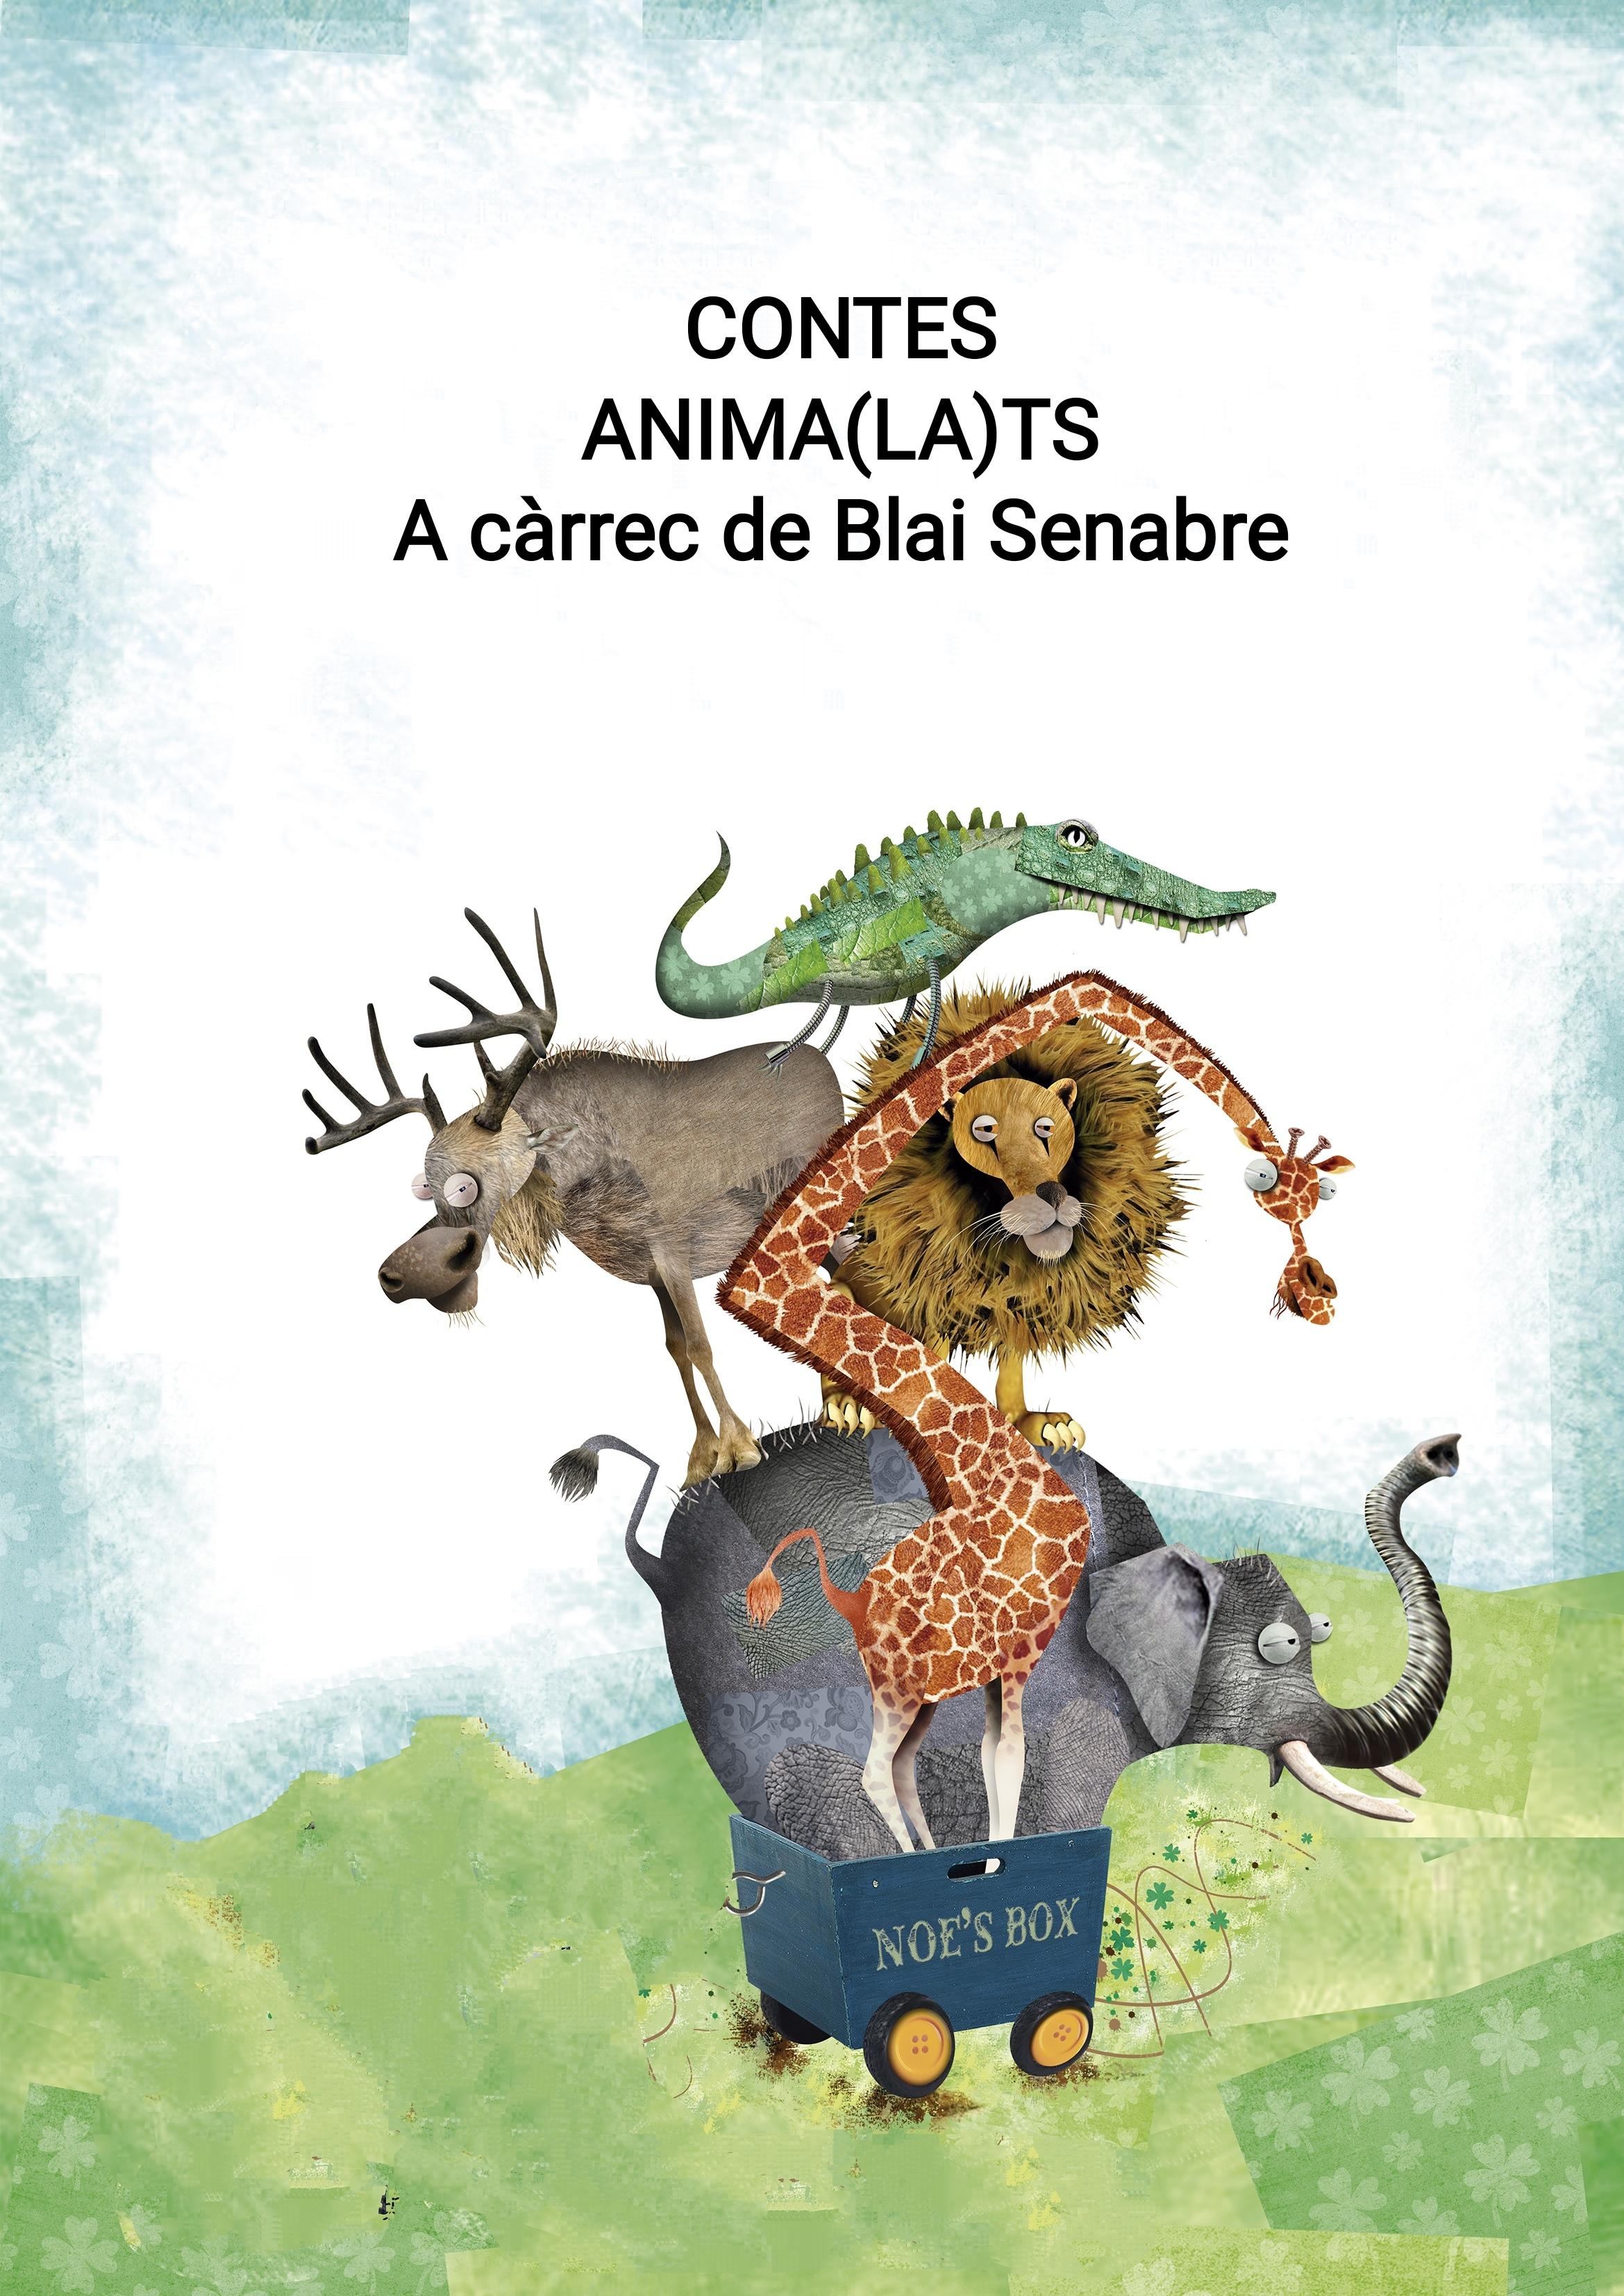 contes animalats